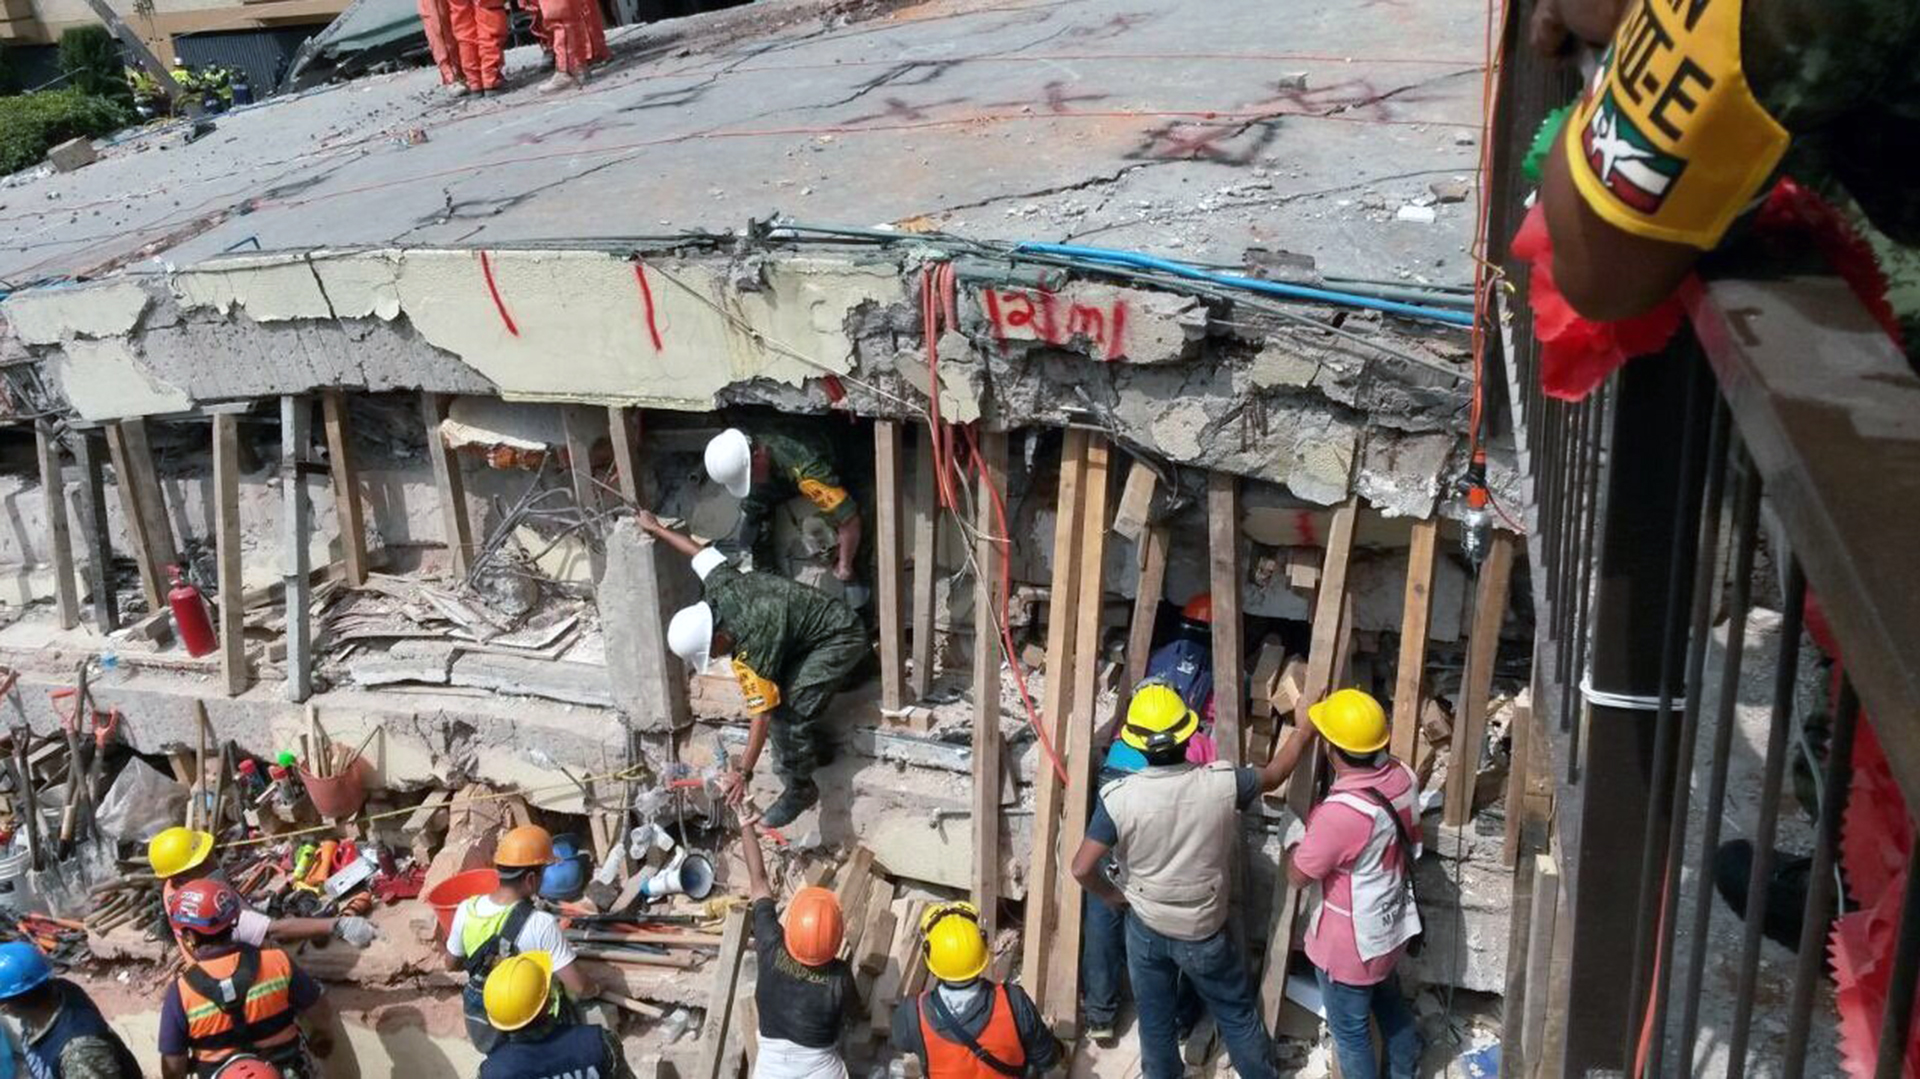 Mexico City earthquake Enrique Rebsamen School rescue-159532.jpg86905667